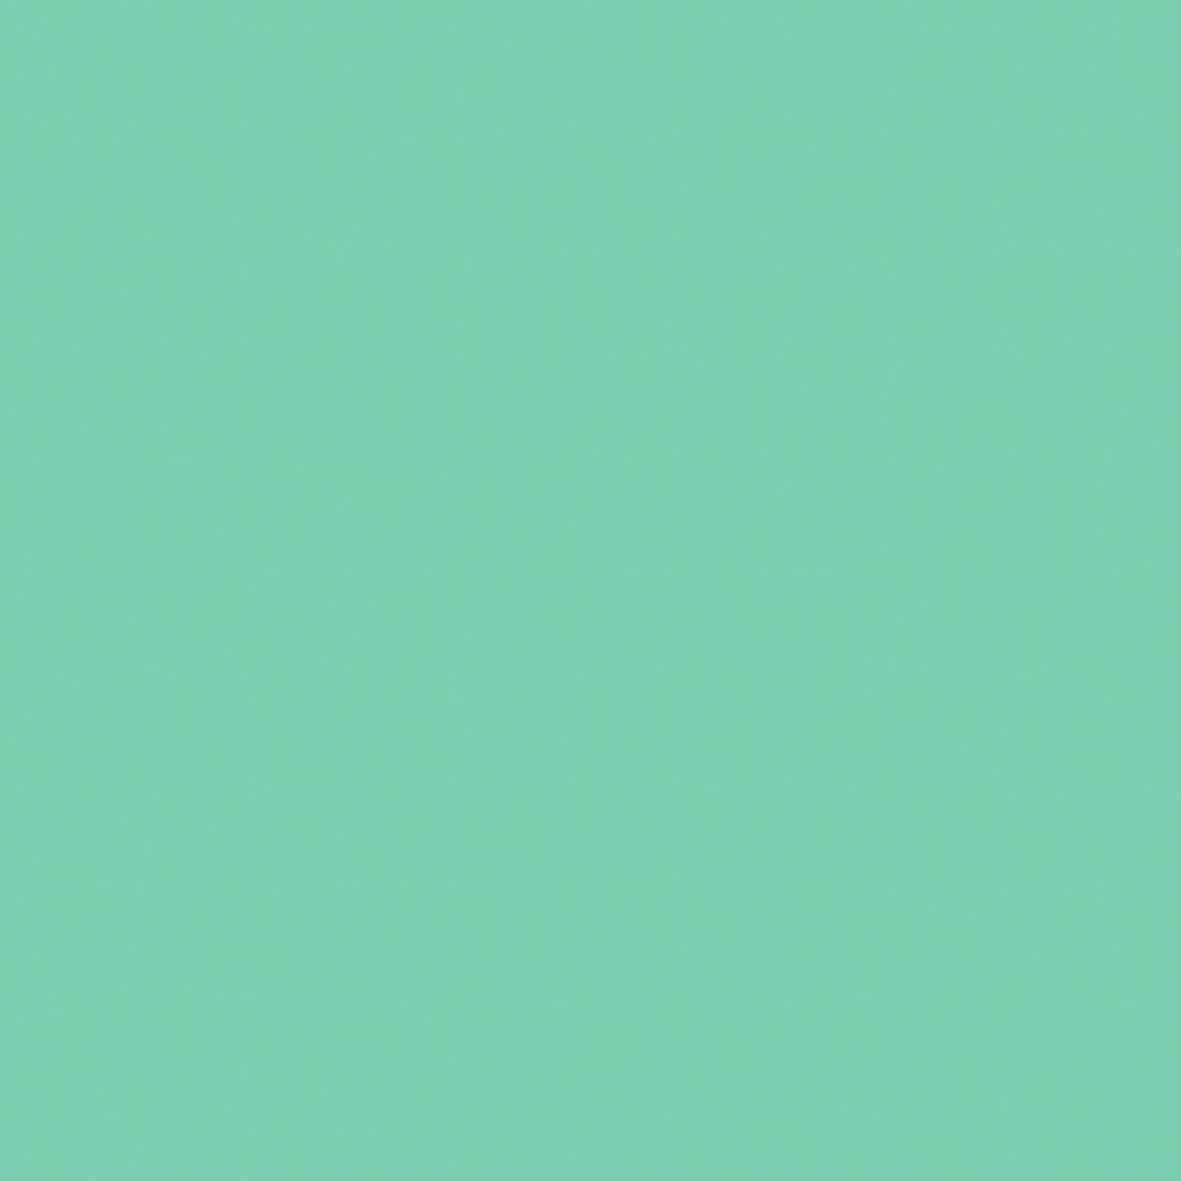 Verde Acalanto